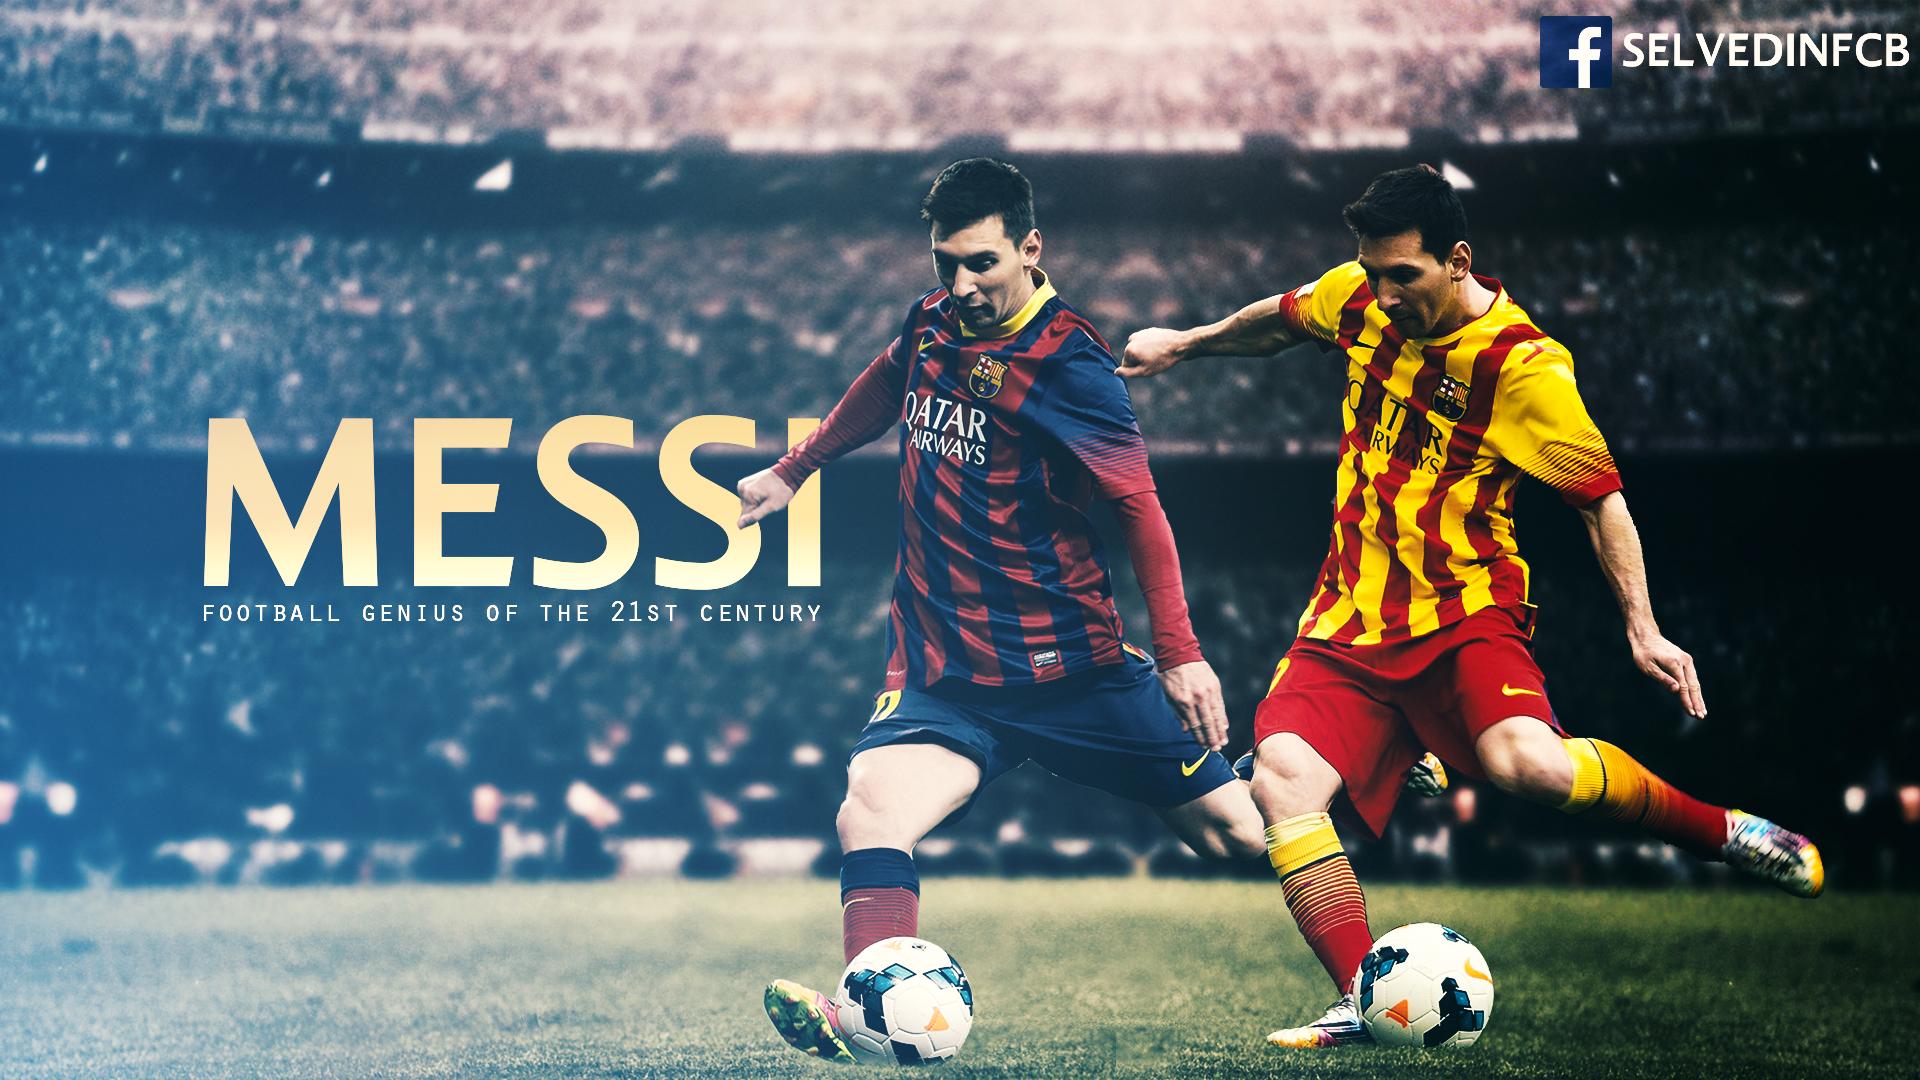 Soccer wallpaper messi